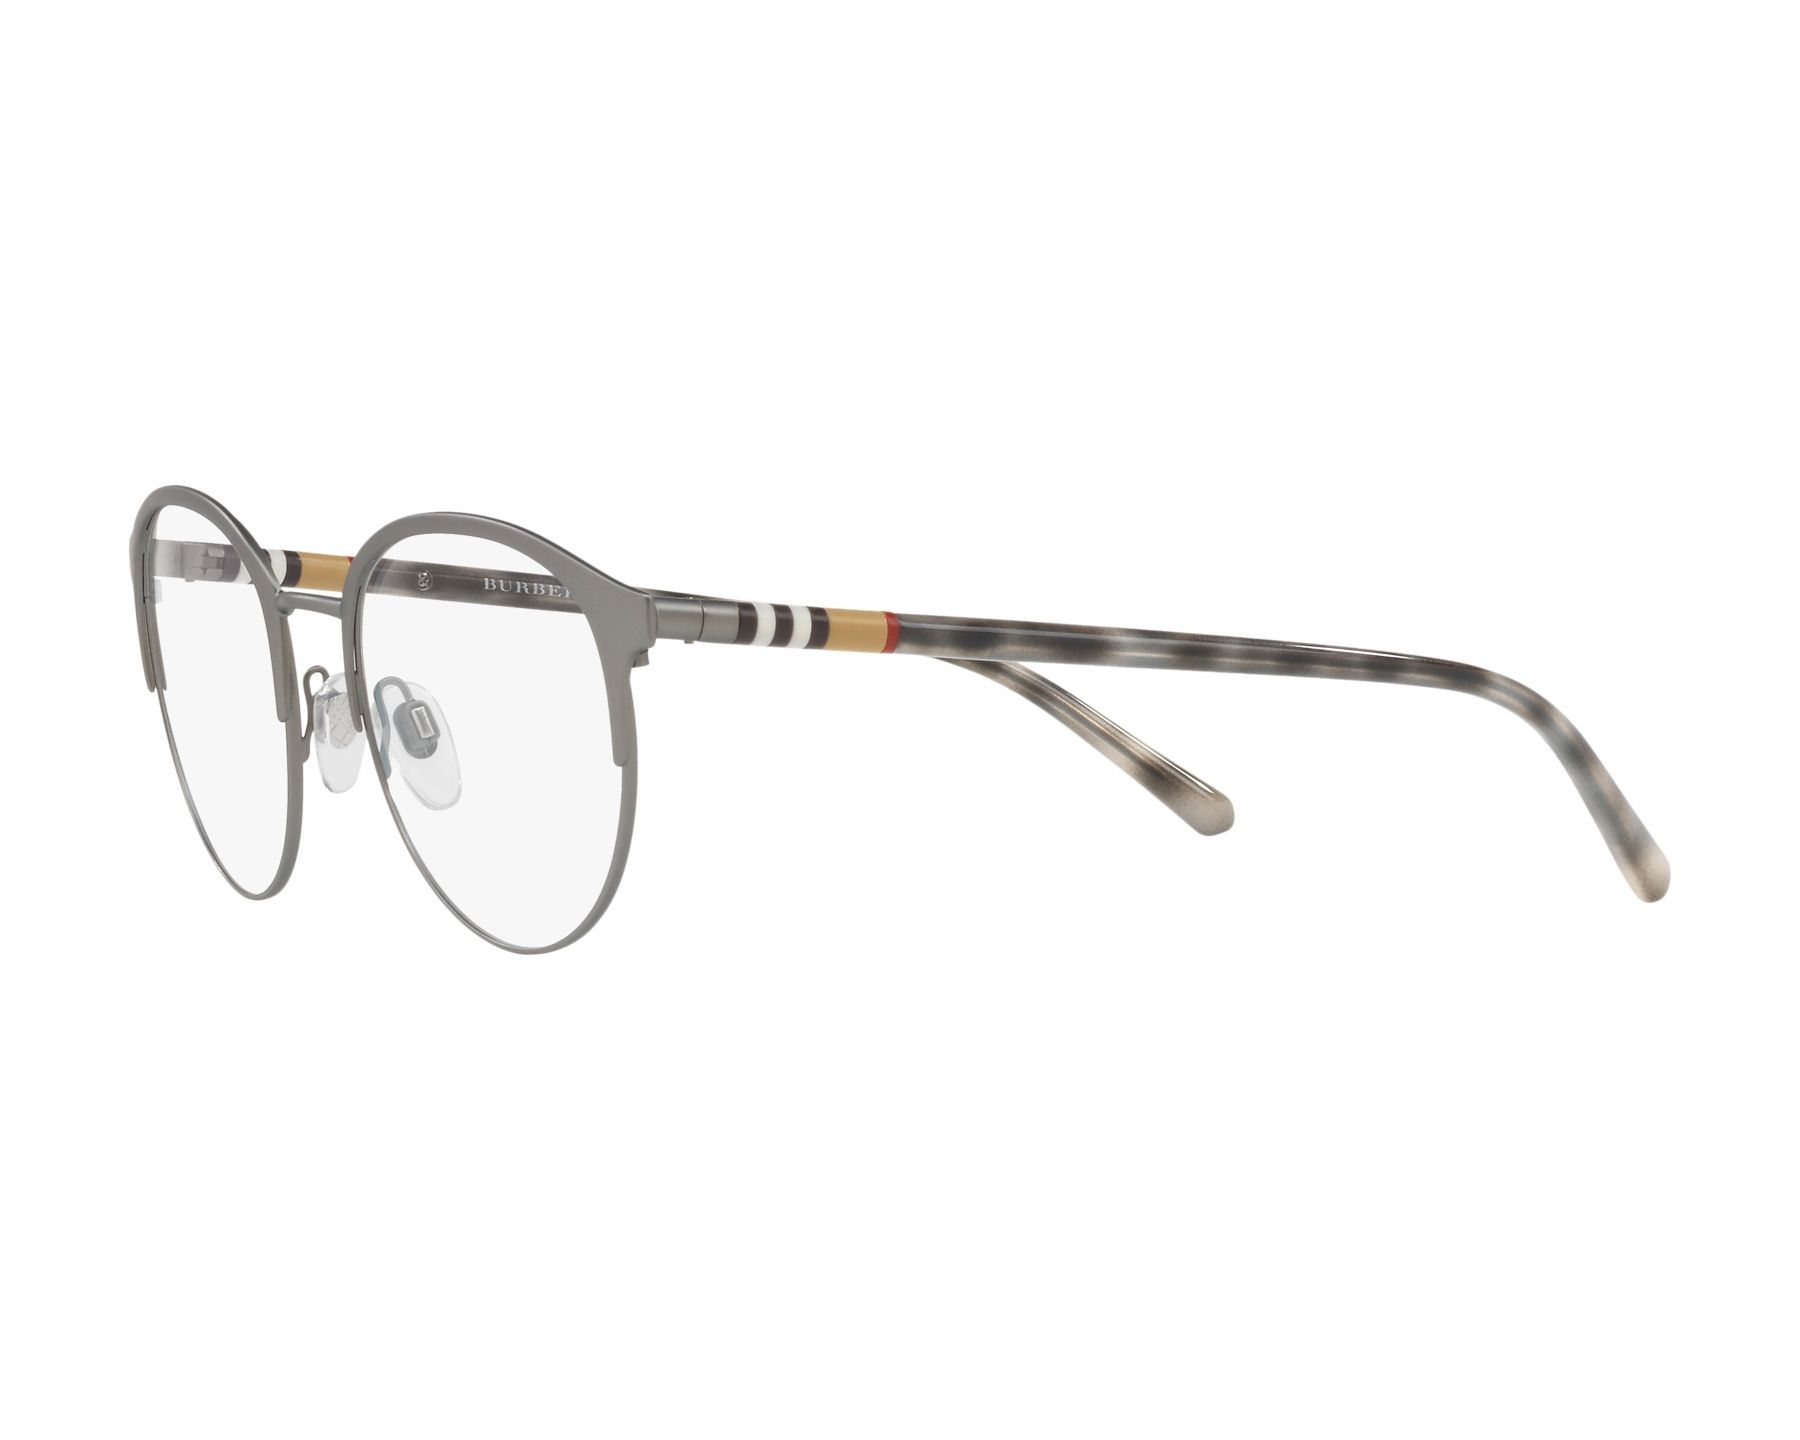 eyeglasses Burberry BE-1318 1014 51-19 Gun Grey 360 degree view 3